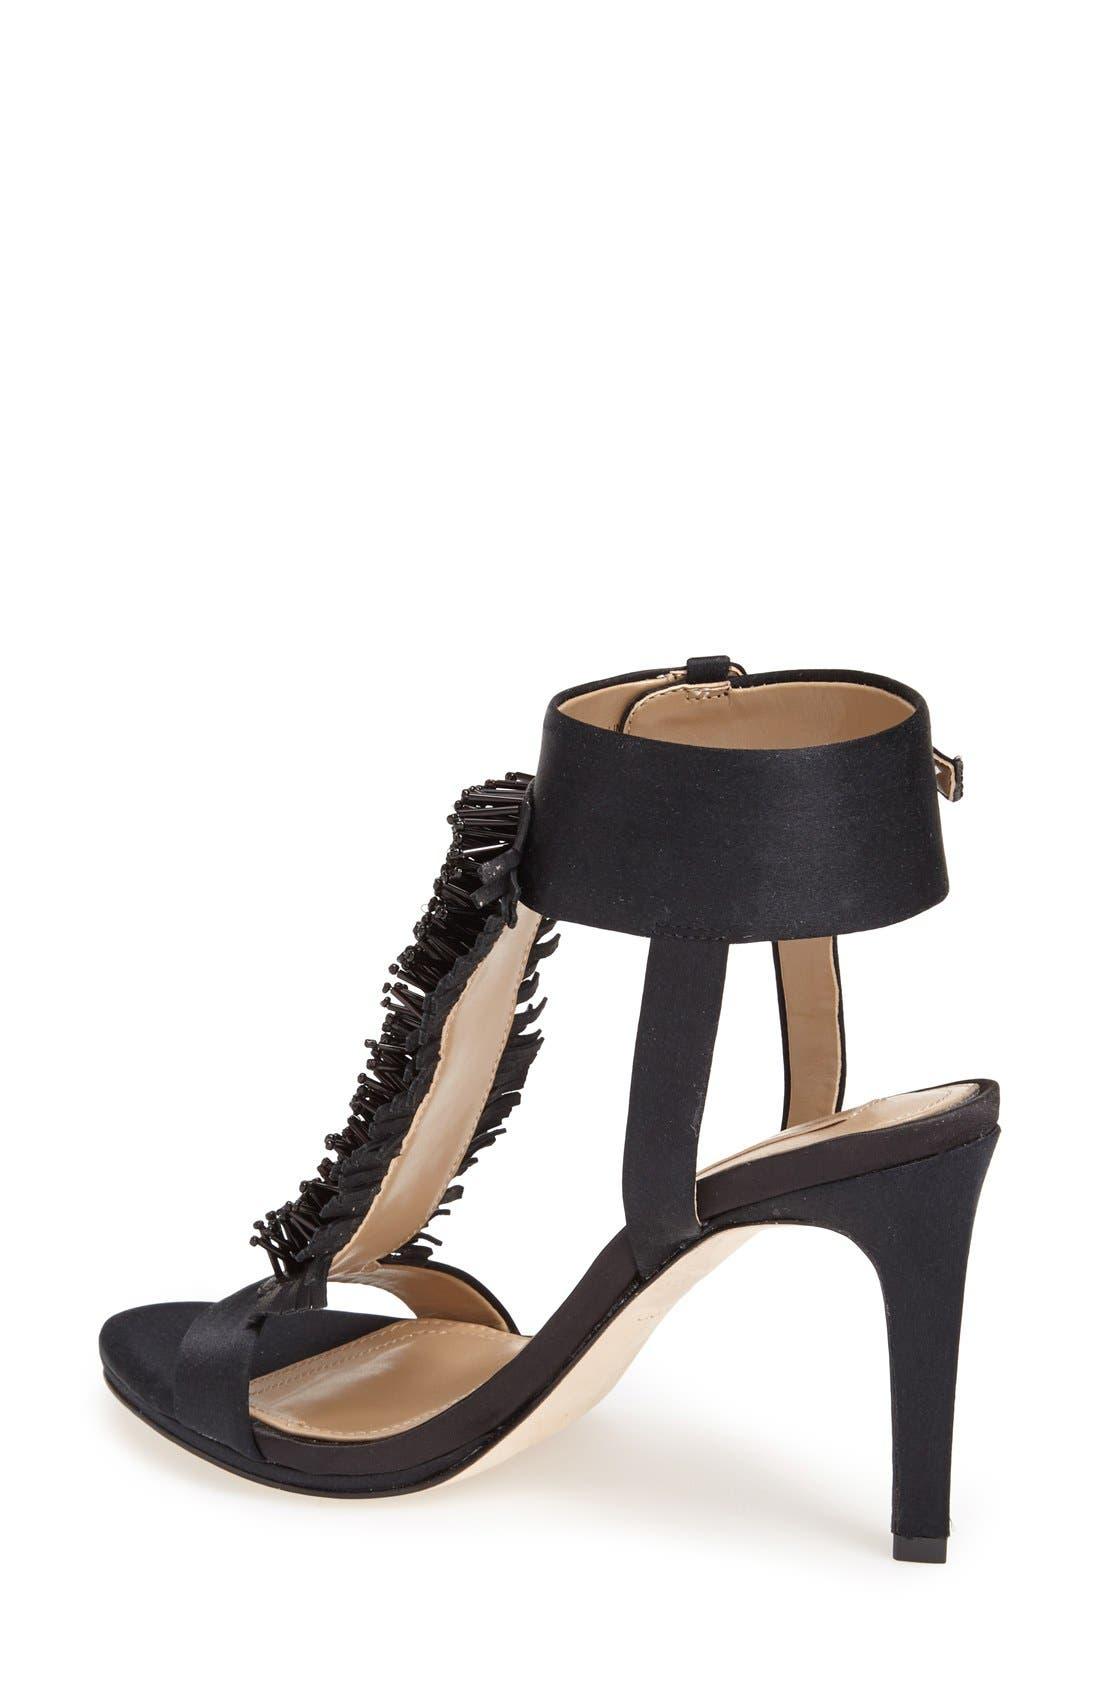 Alternate Image 2  - BCBGMAXAZRIA 'Ma-Limbo' Fringe T-Strap Satin Sandal (Women)